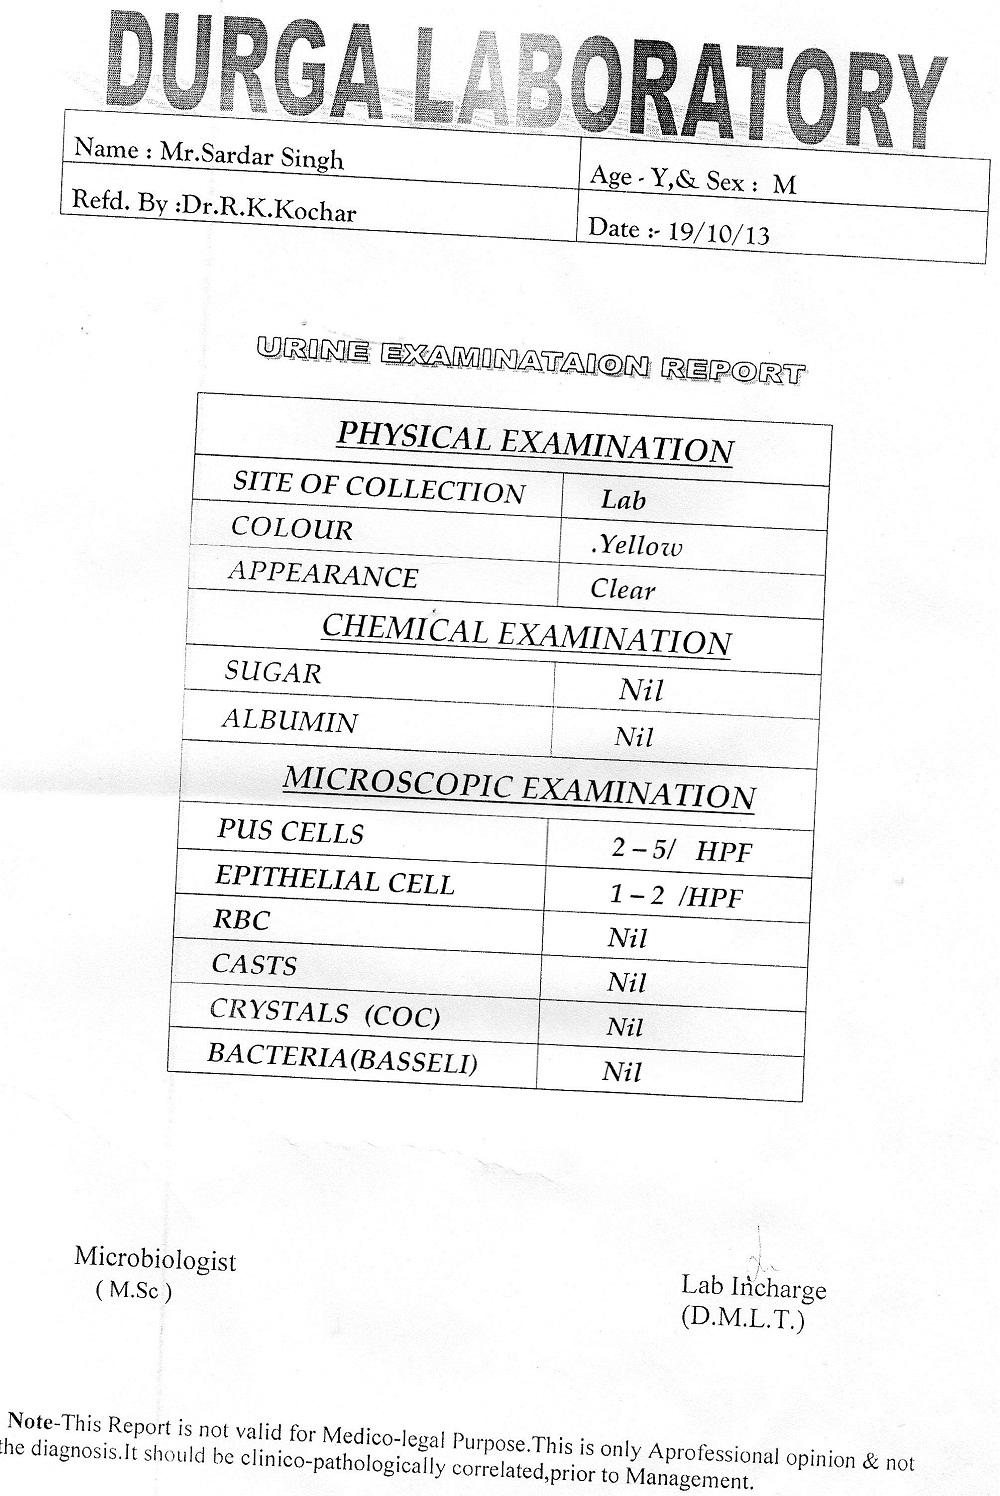 sardar-singh-gall-bladder-stone-treatment-6